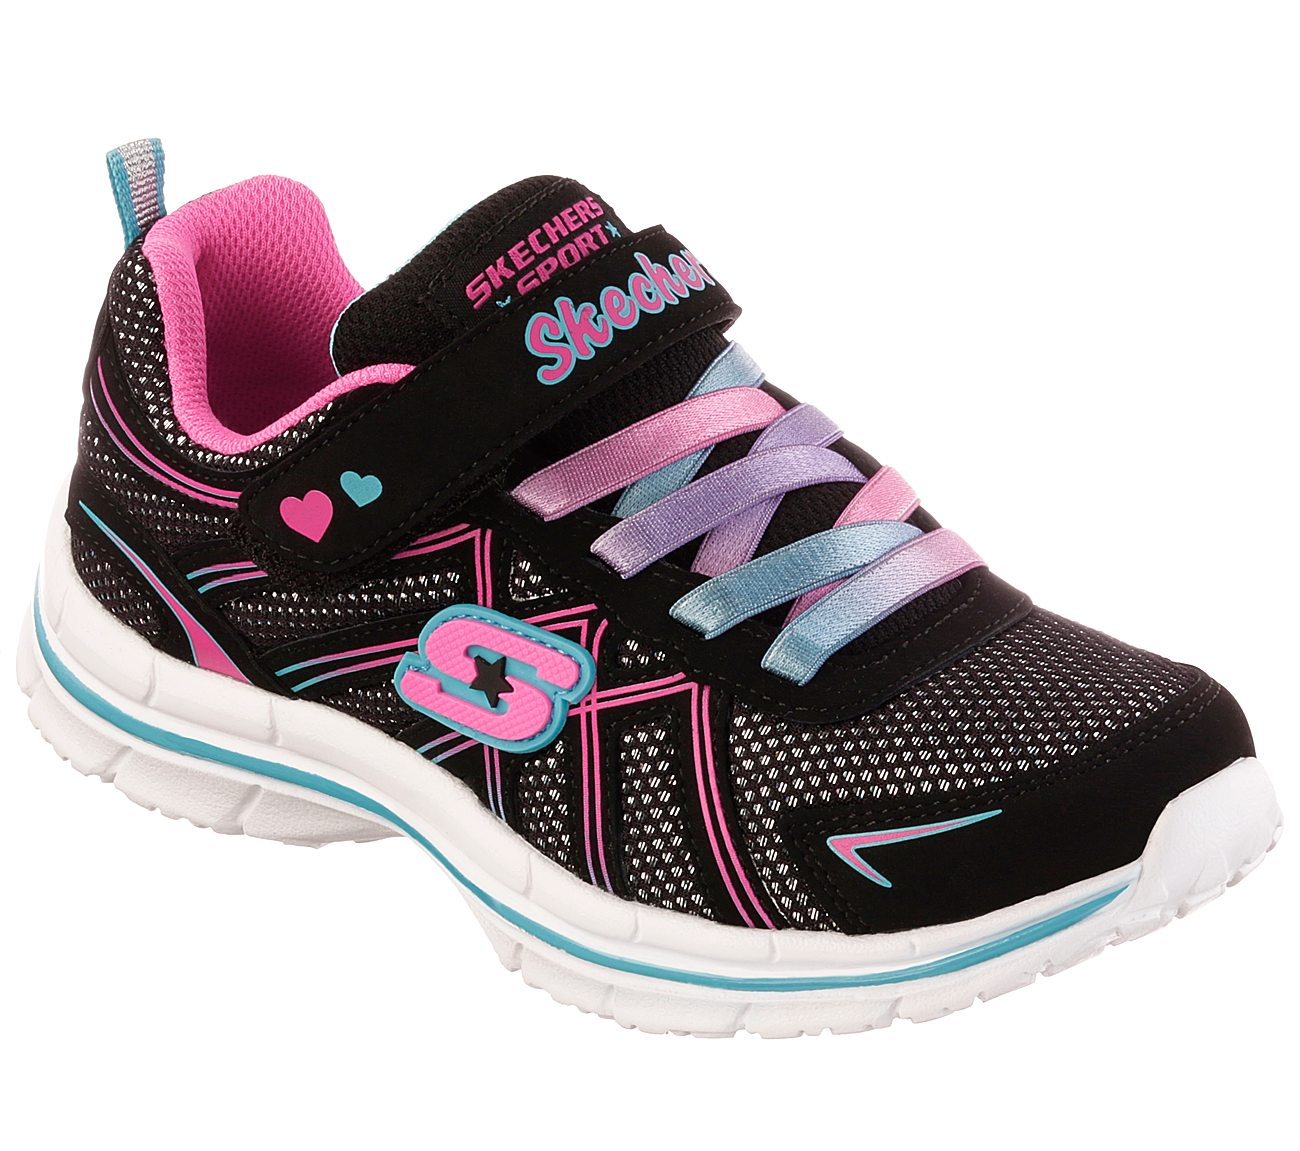 Buy SKECHERS Sugar Stacks Sport Shoes only  45.00 4beb296c492